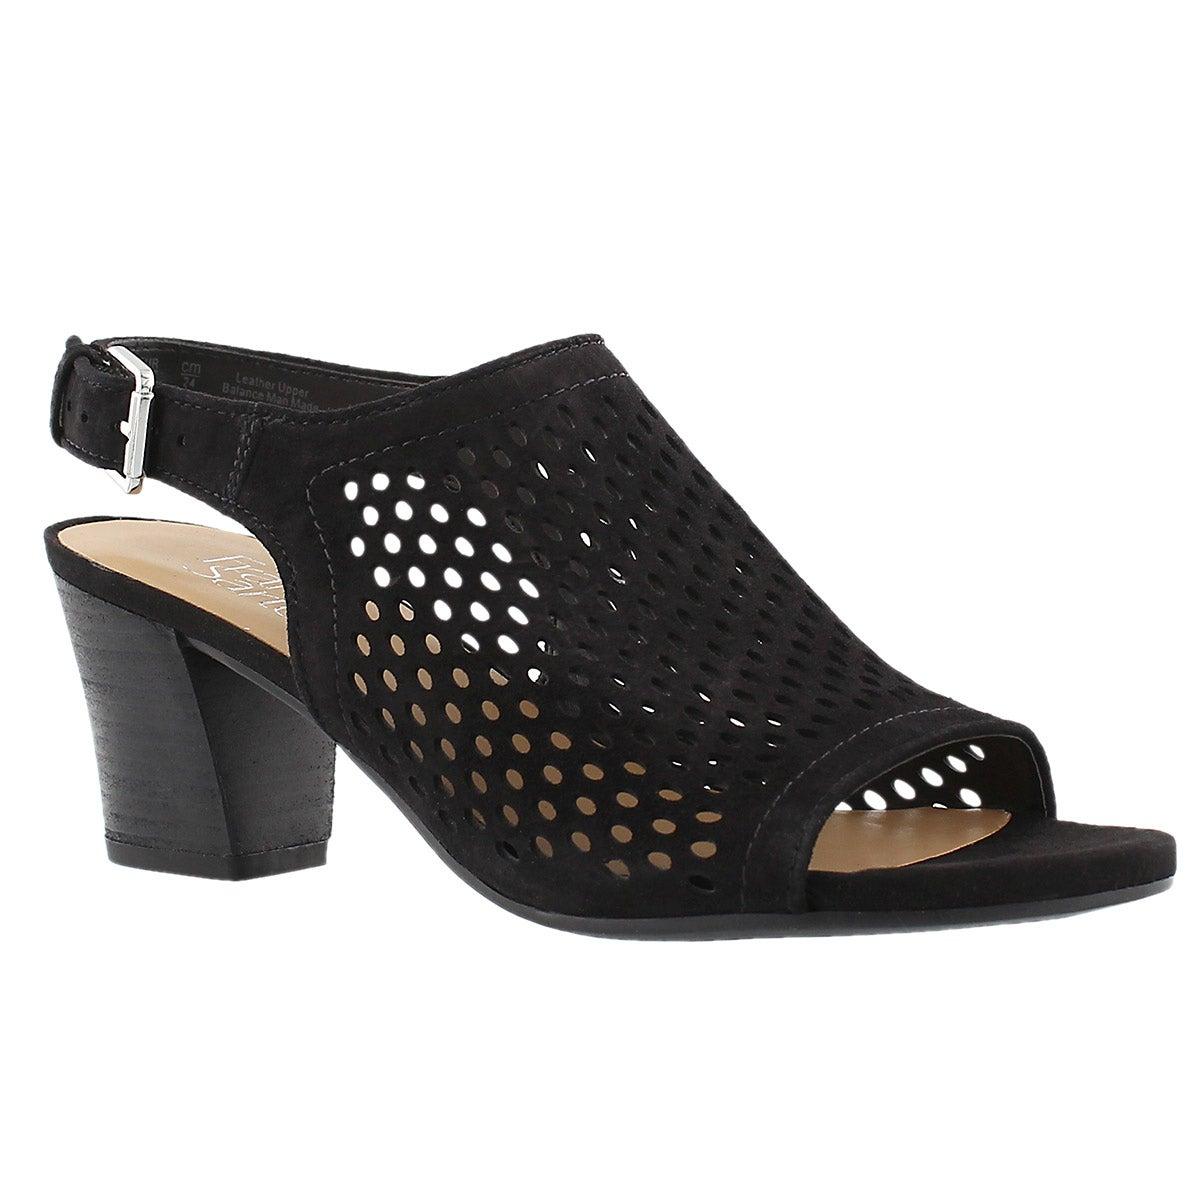 Women's MONACO 2 black perforated dress sandals